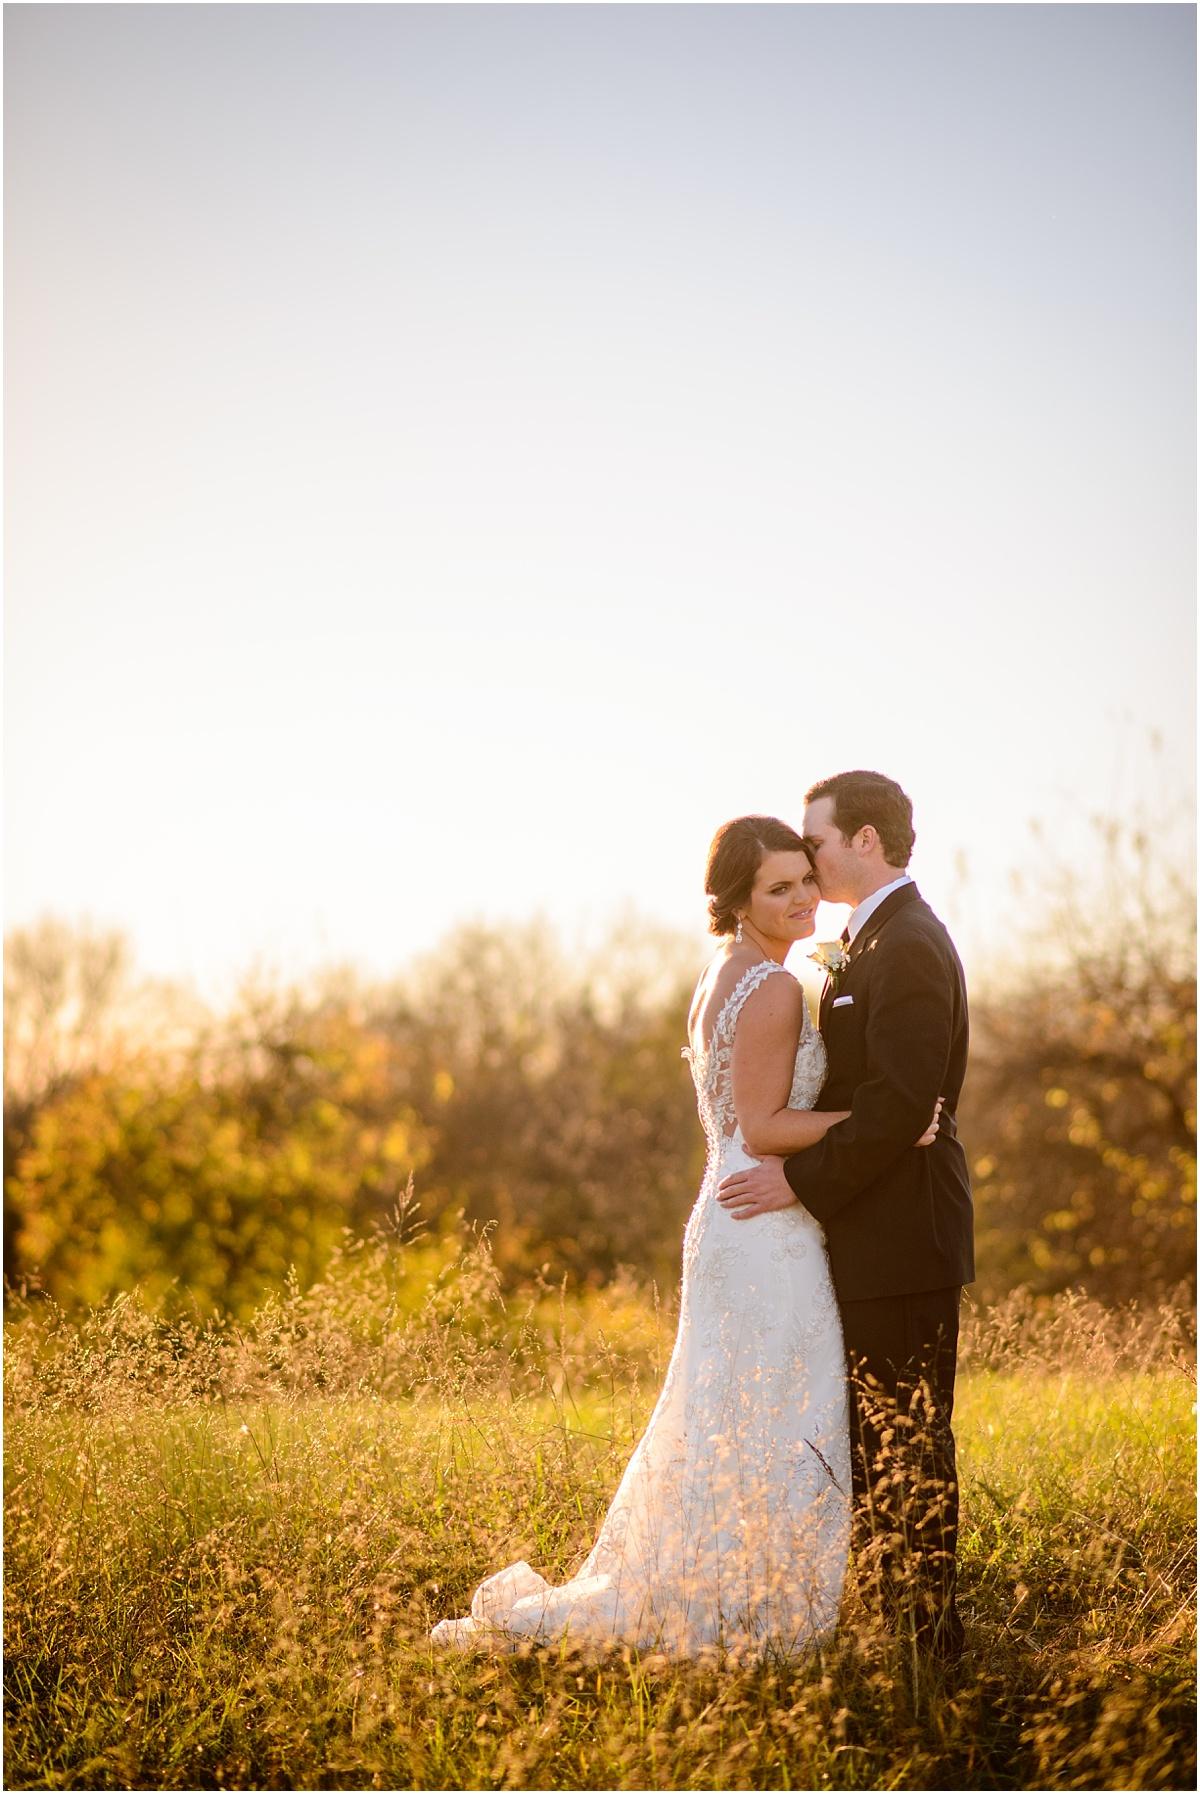 Greg Smit Photography Nashville wedding photographer Tomlinson Family Farm_0046